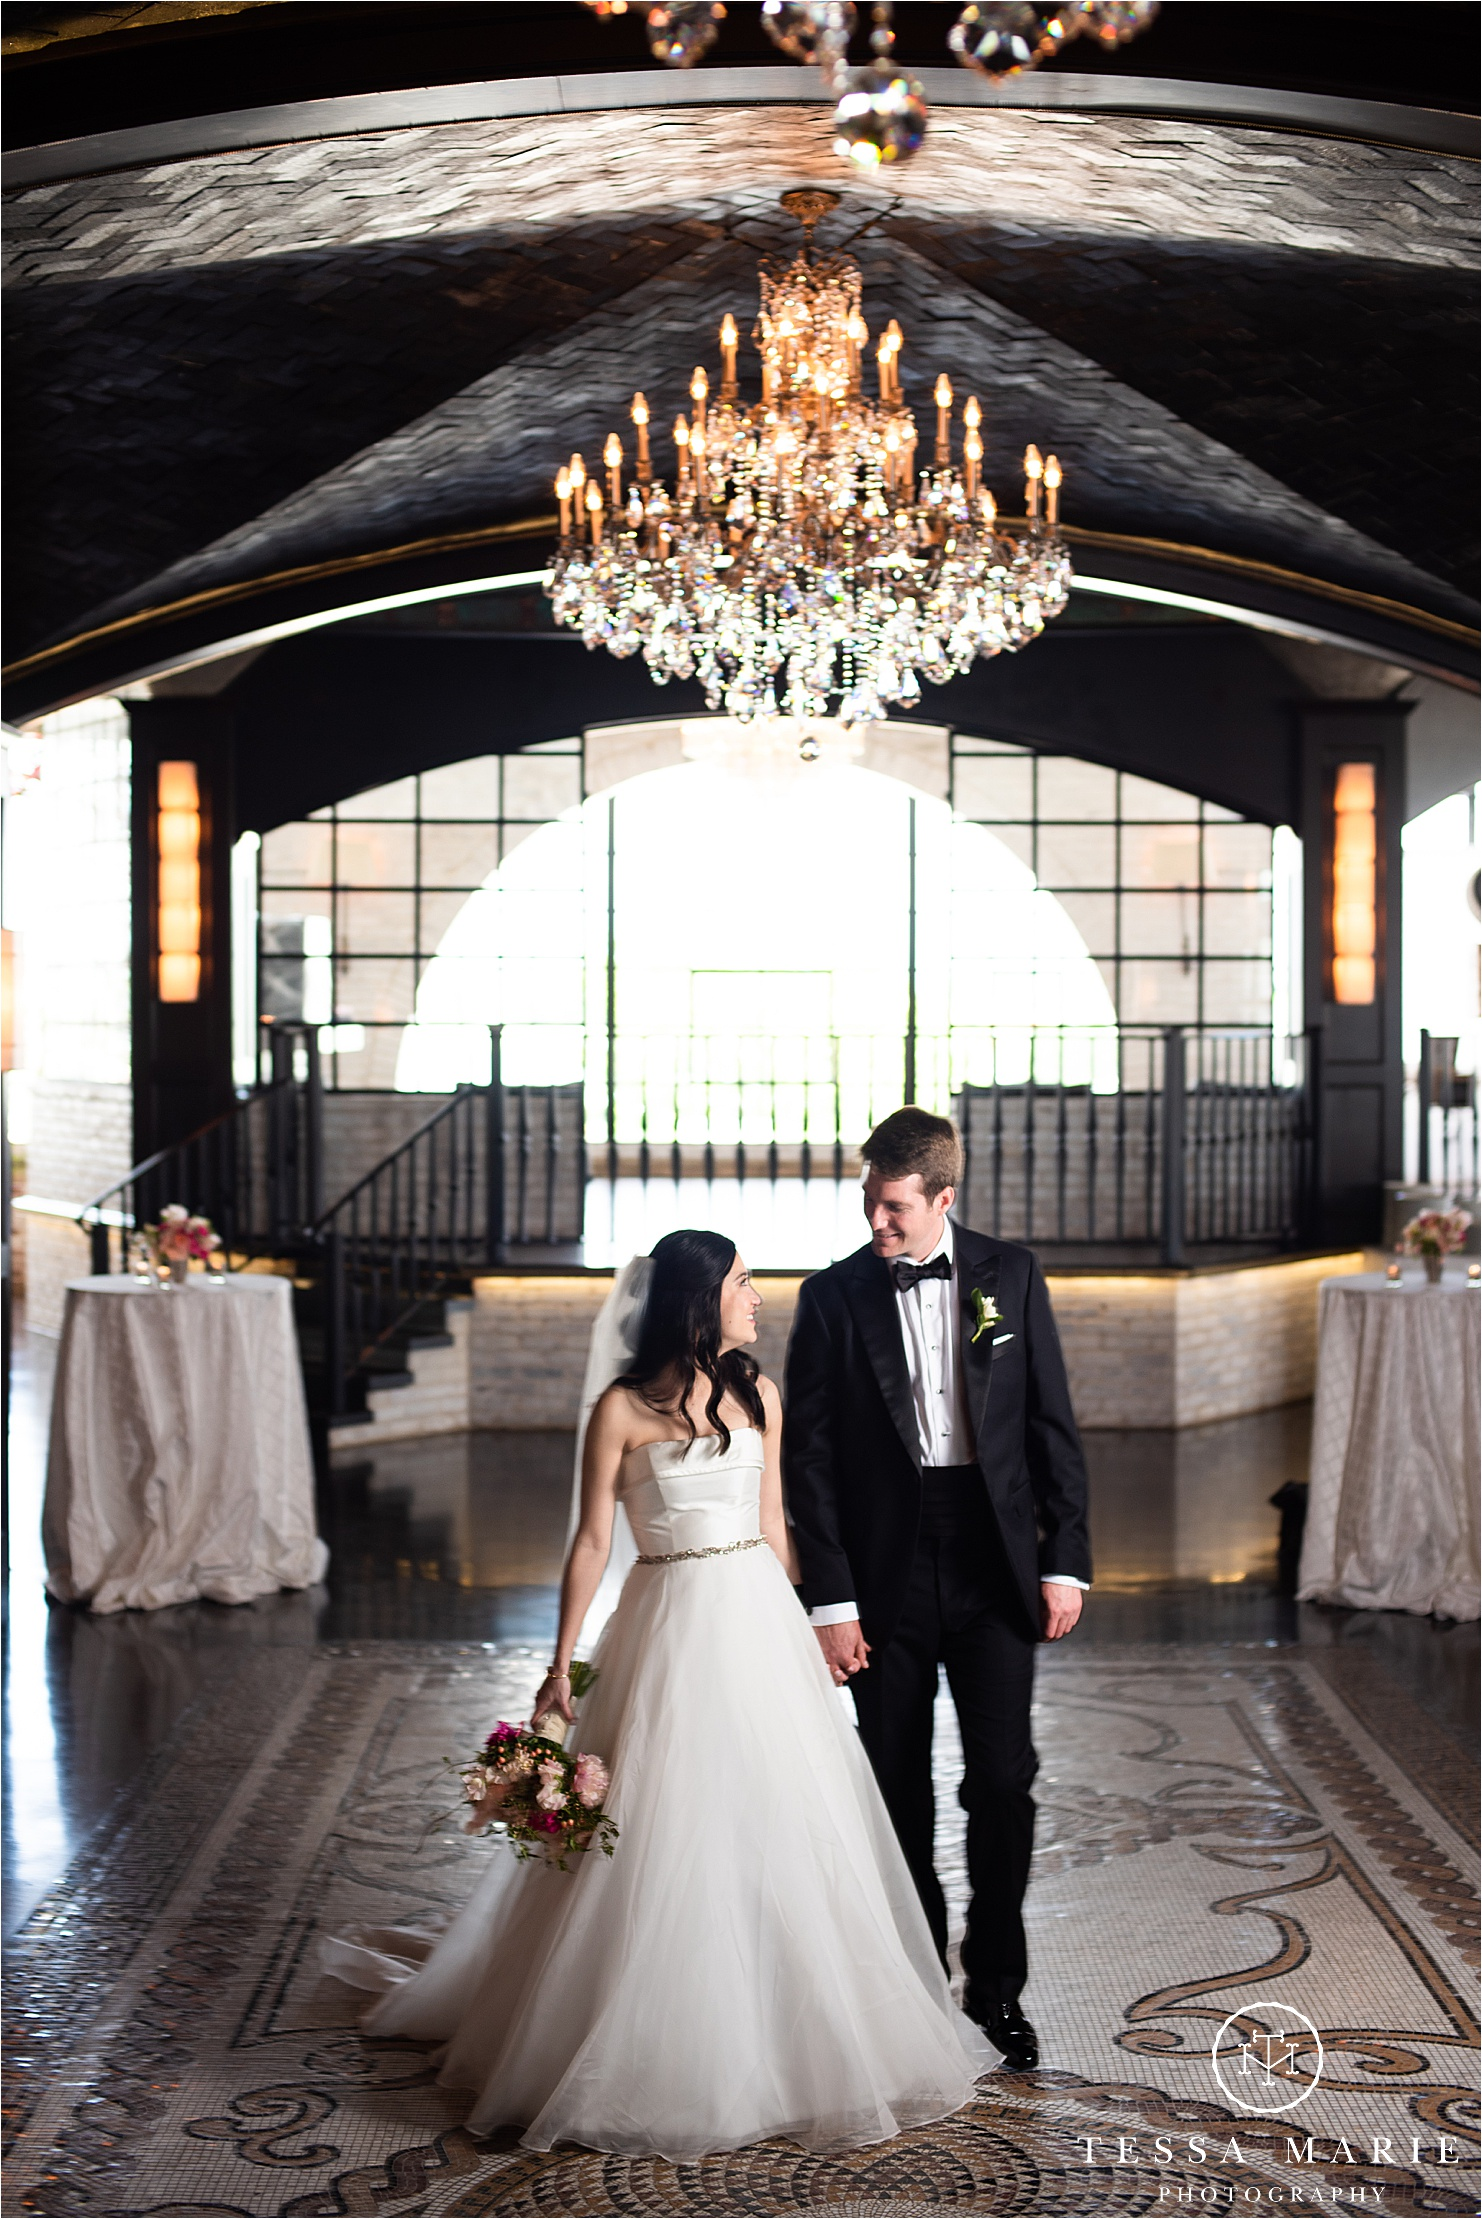 Tessa_marie_weddings_houston_wedding_photographer_The_astorian_0071.jpg